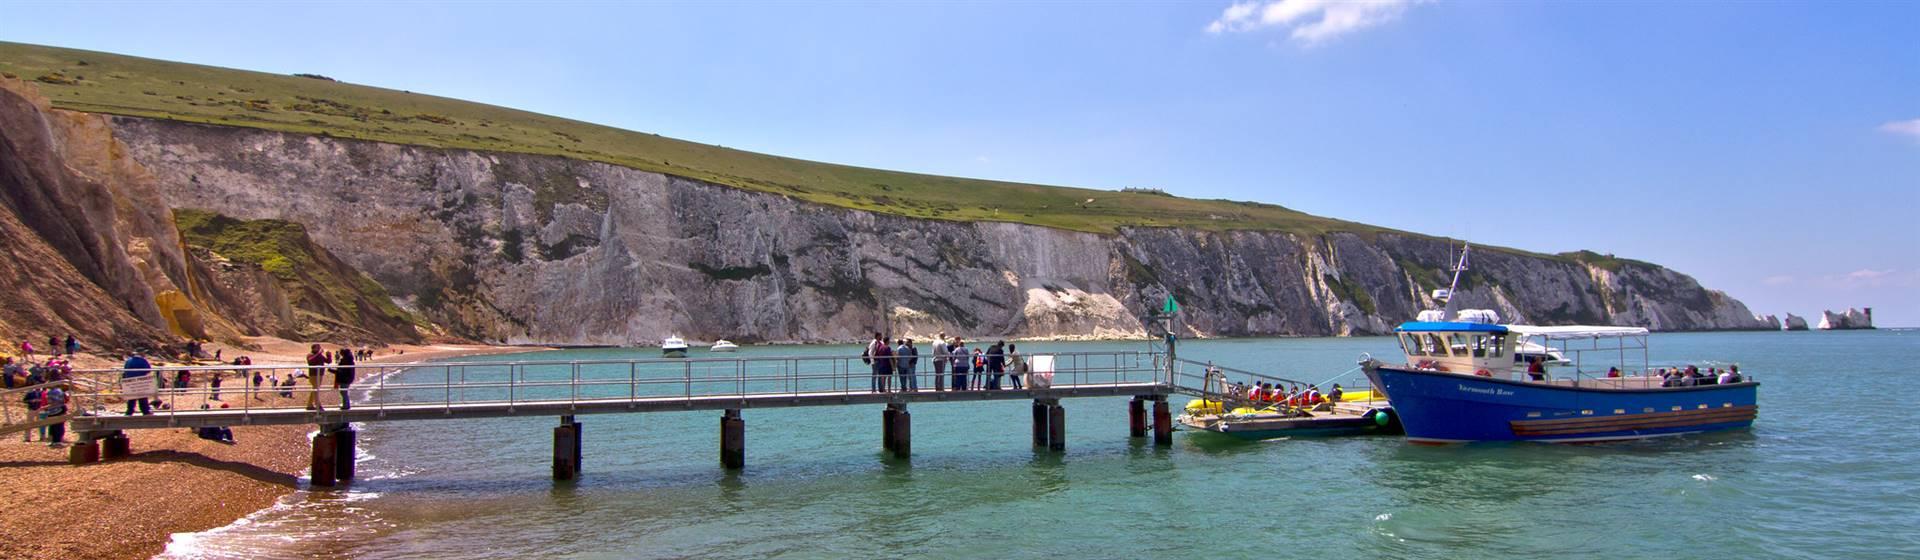 Alum Bay & The Needles - visitisleofwight.co.uk